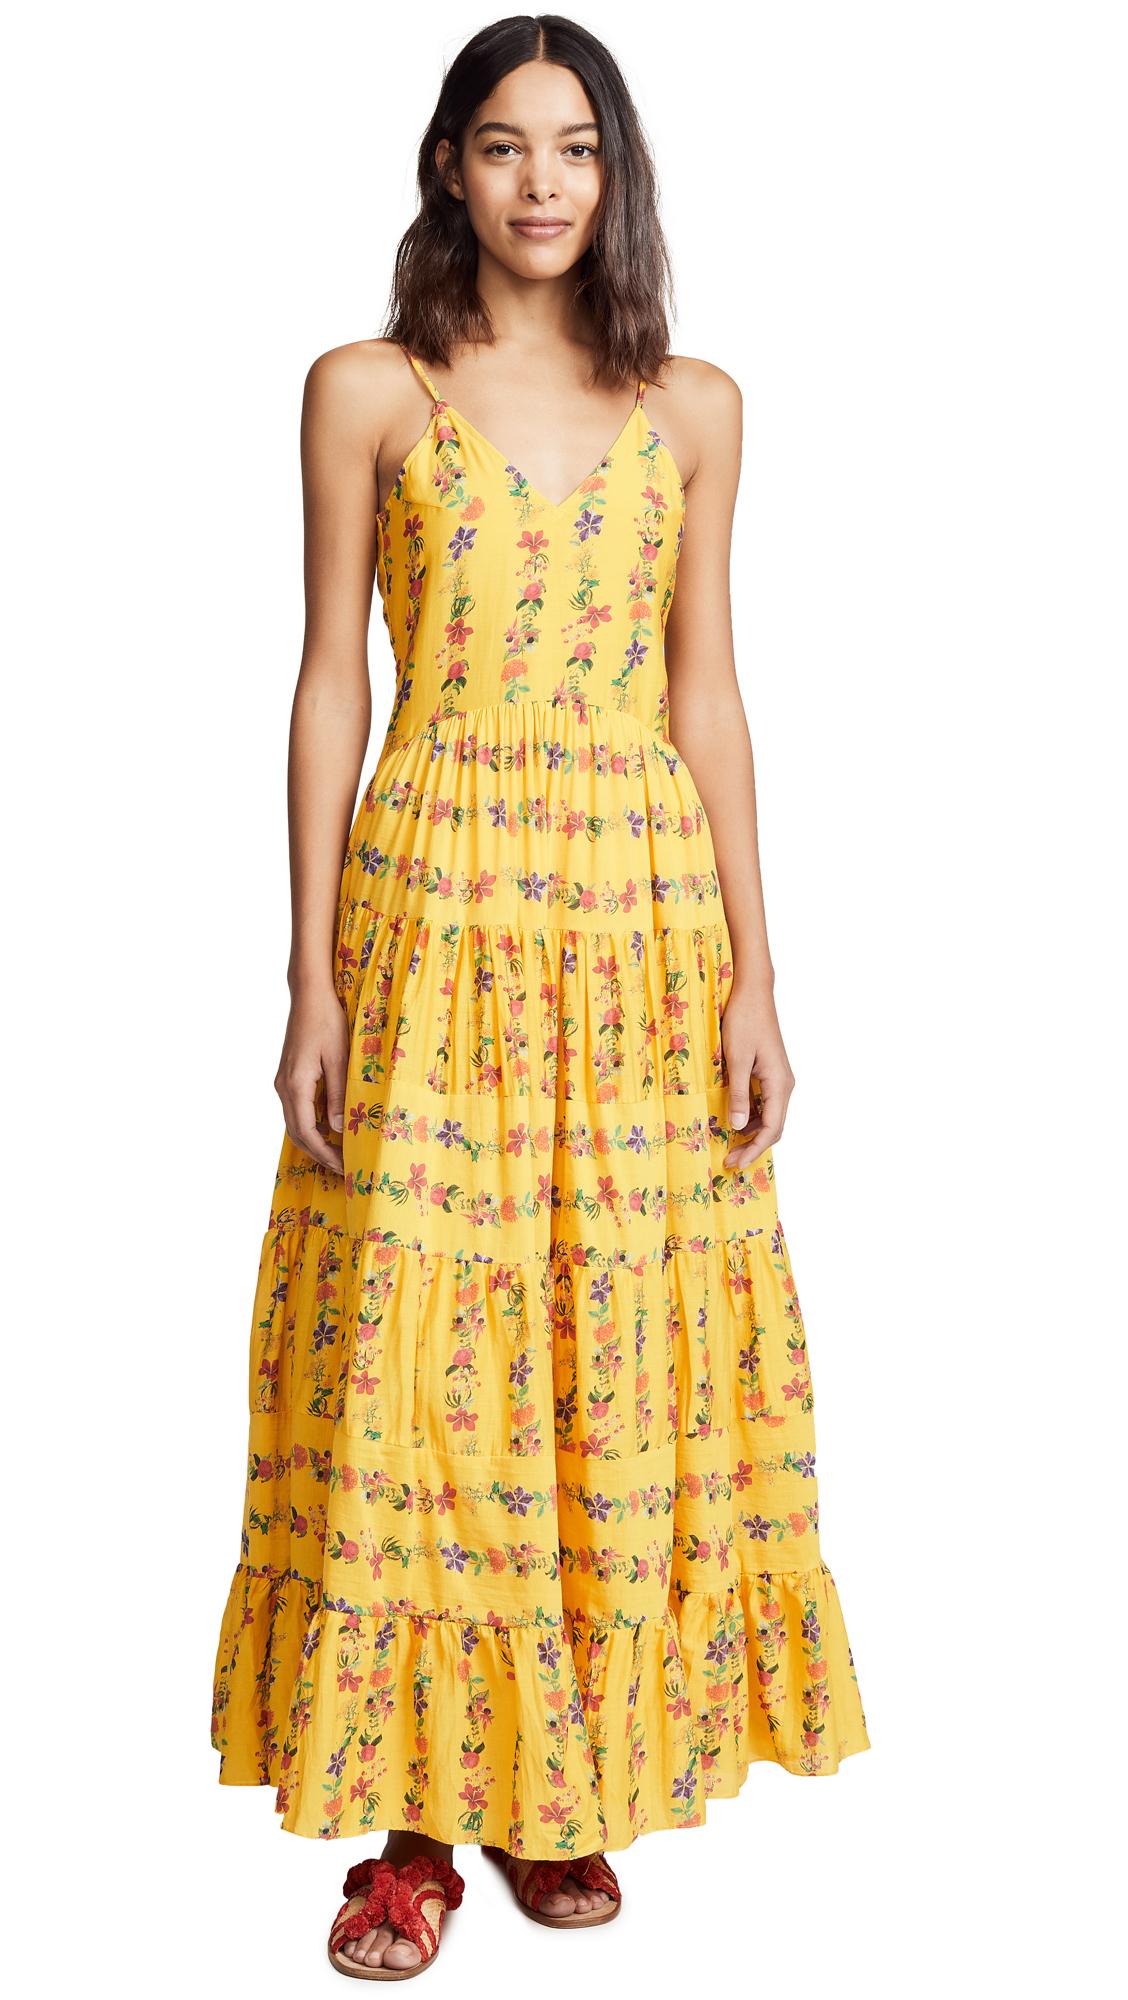 CAROLINA K Marieta Dress in Flower Stripe Sunshine